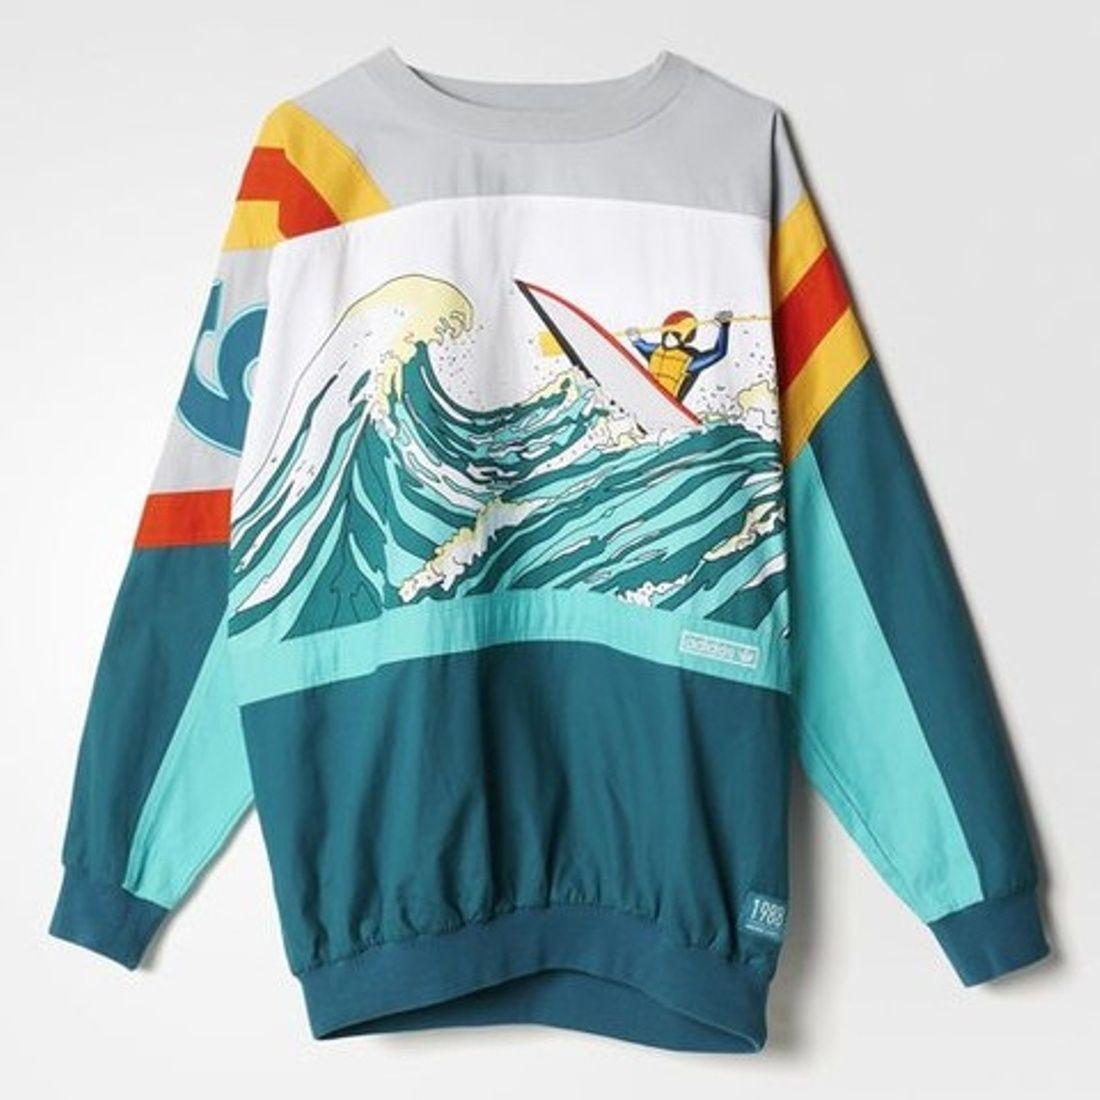 77e8896e Adidas Vintage 80s Adidas Devils Toe Nail Sweatshirt Size M $300 - Grailed